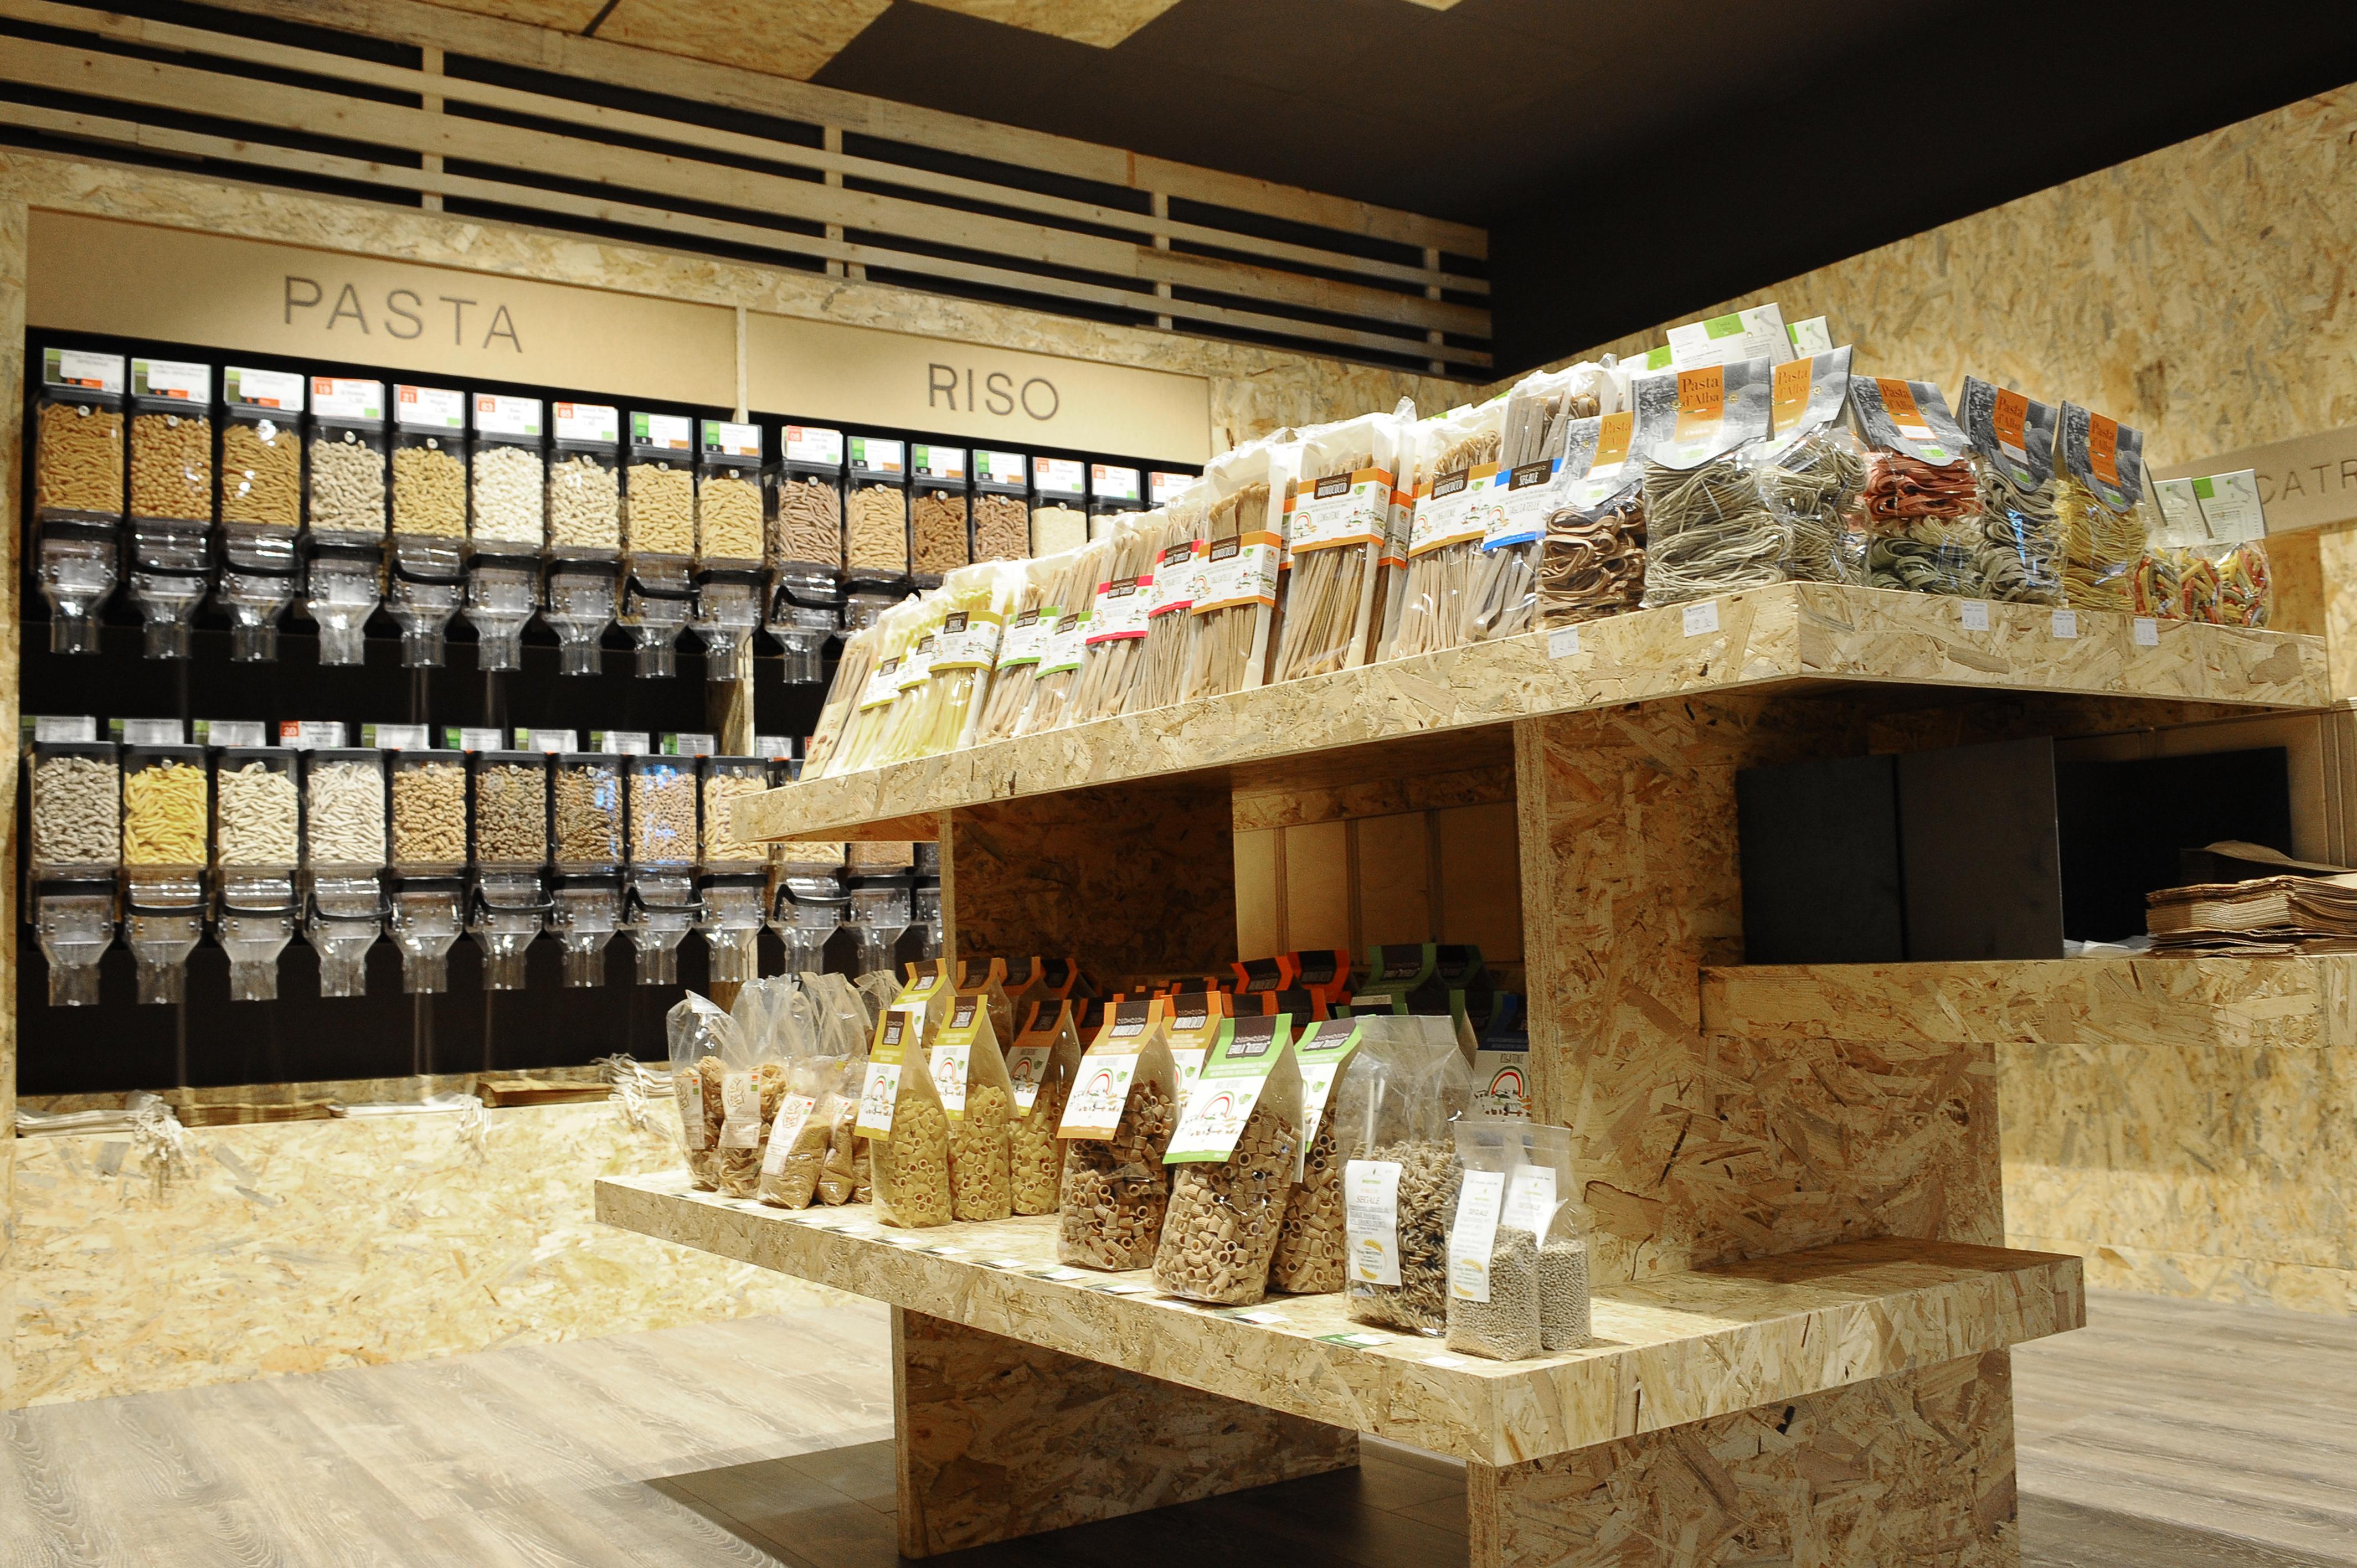 Beautiful negozi arredamento bergamo photos for Outlet arredamento calenzano